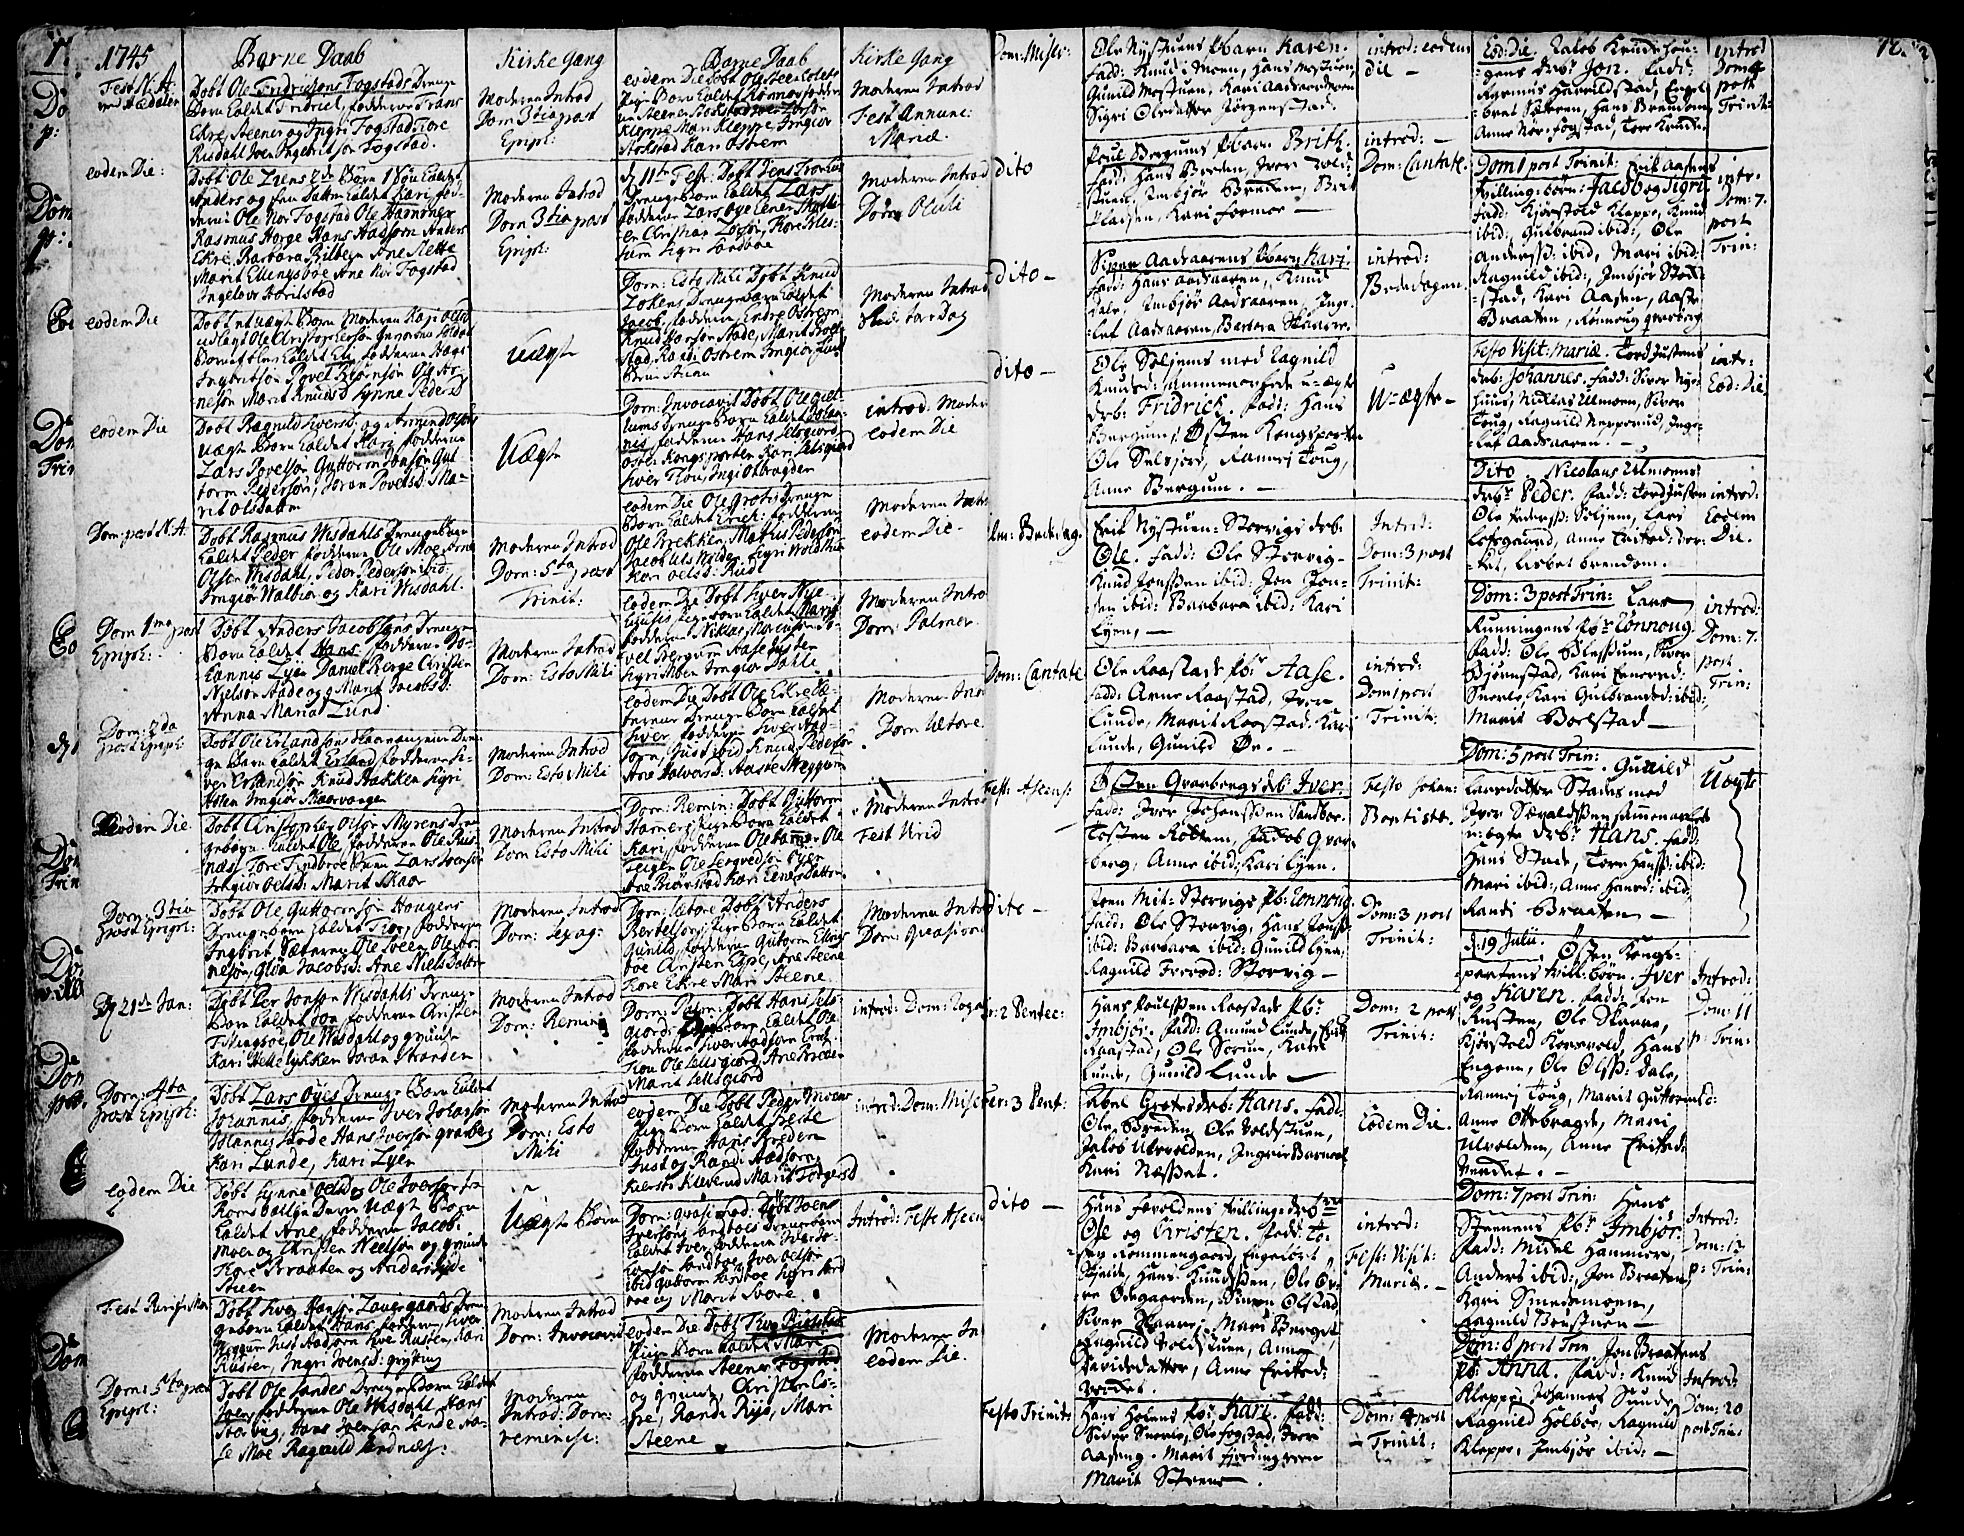 SAH, Vågå prestekontor, Ministerialbok nr. 1, 1739-1810, s. 12